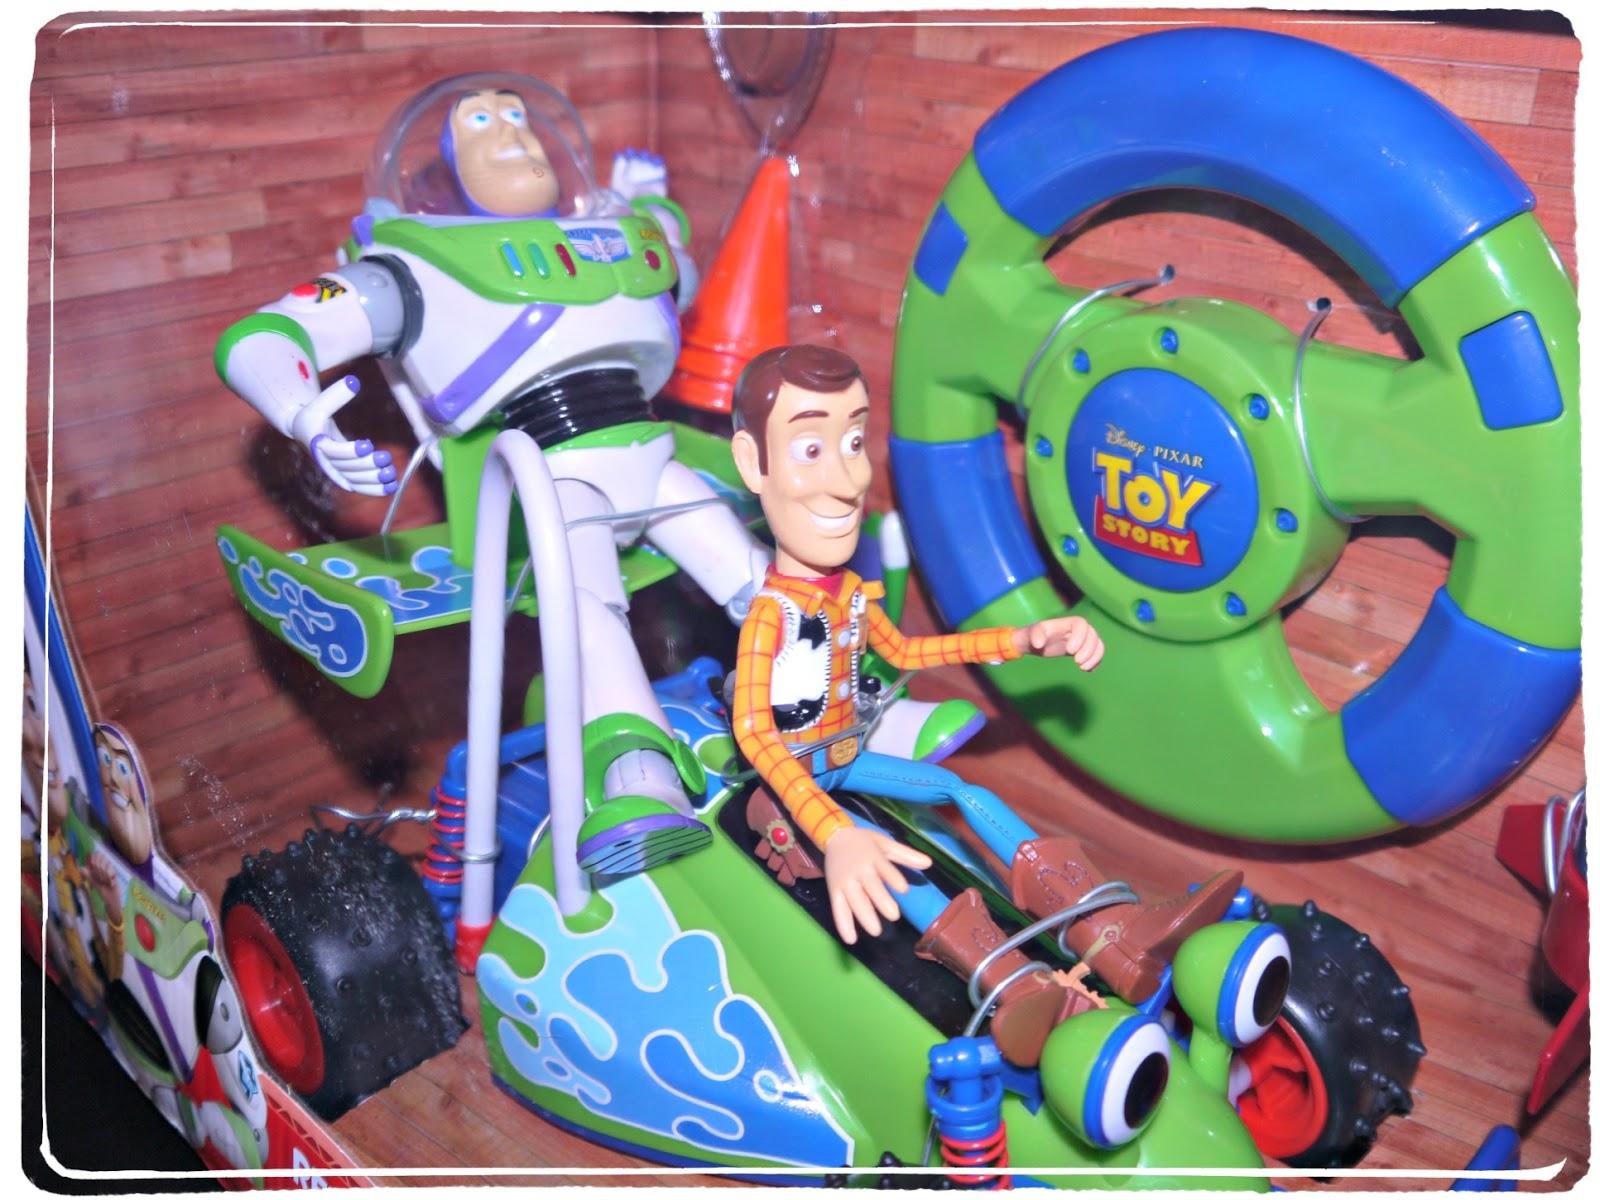 http://3.bp.blogspot.com/-Kcz_cSYqZhM/UMmx20_HTUI/AAAAAAAAMgk/ViH3l4xX5kI/s1600/Toy-Story-RC-toy.jpg